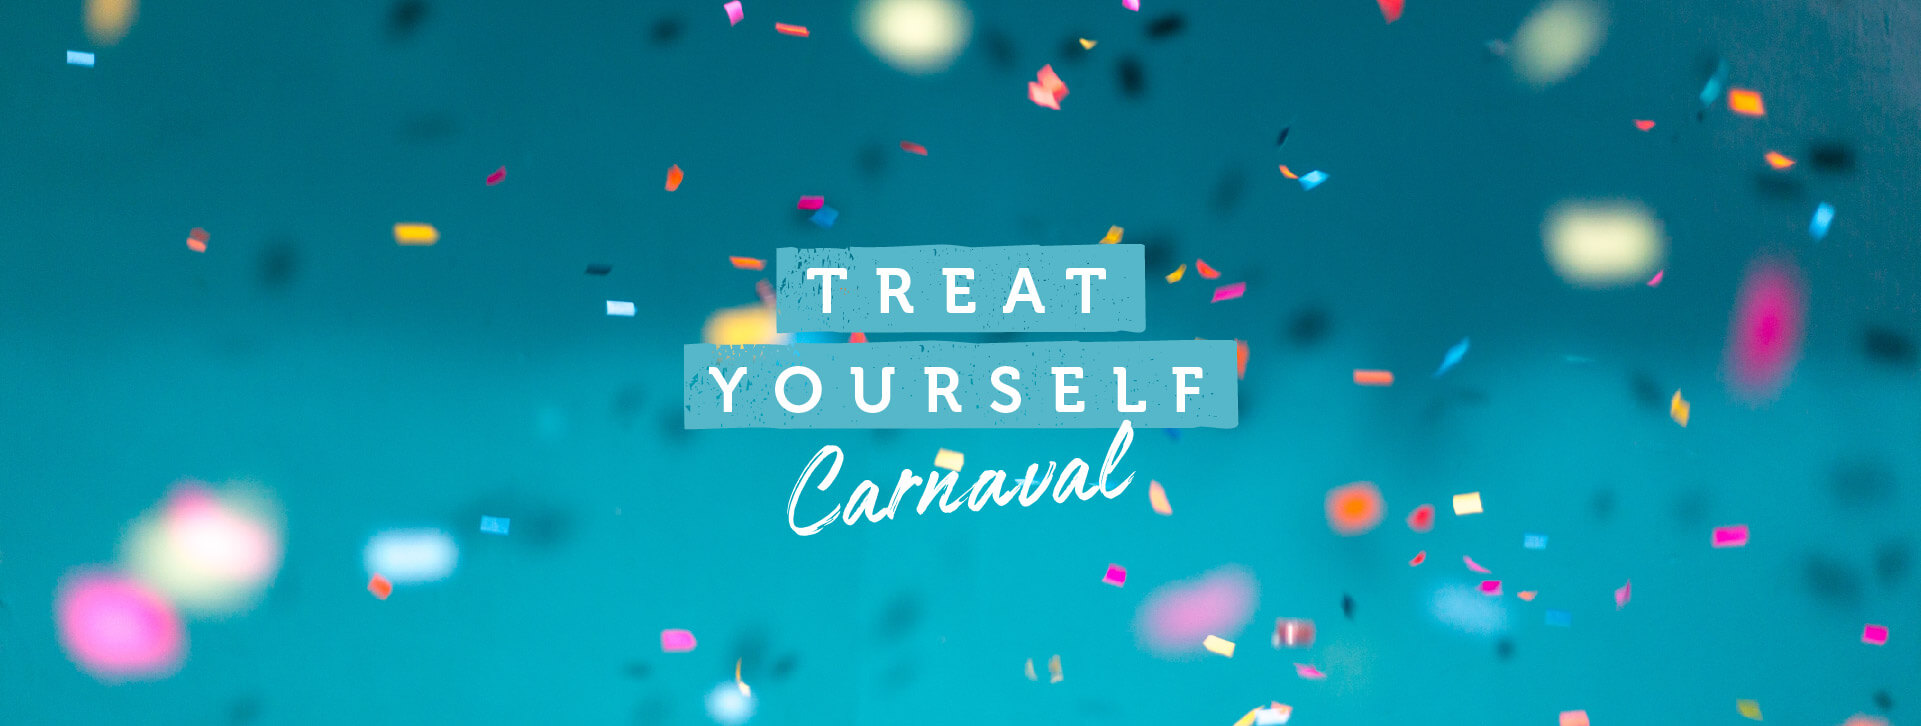 Forum Aveiro   Carnaval